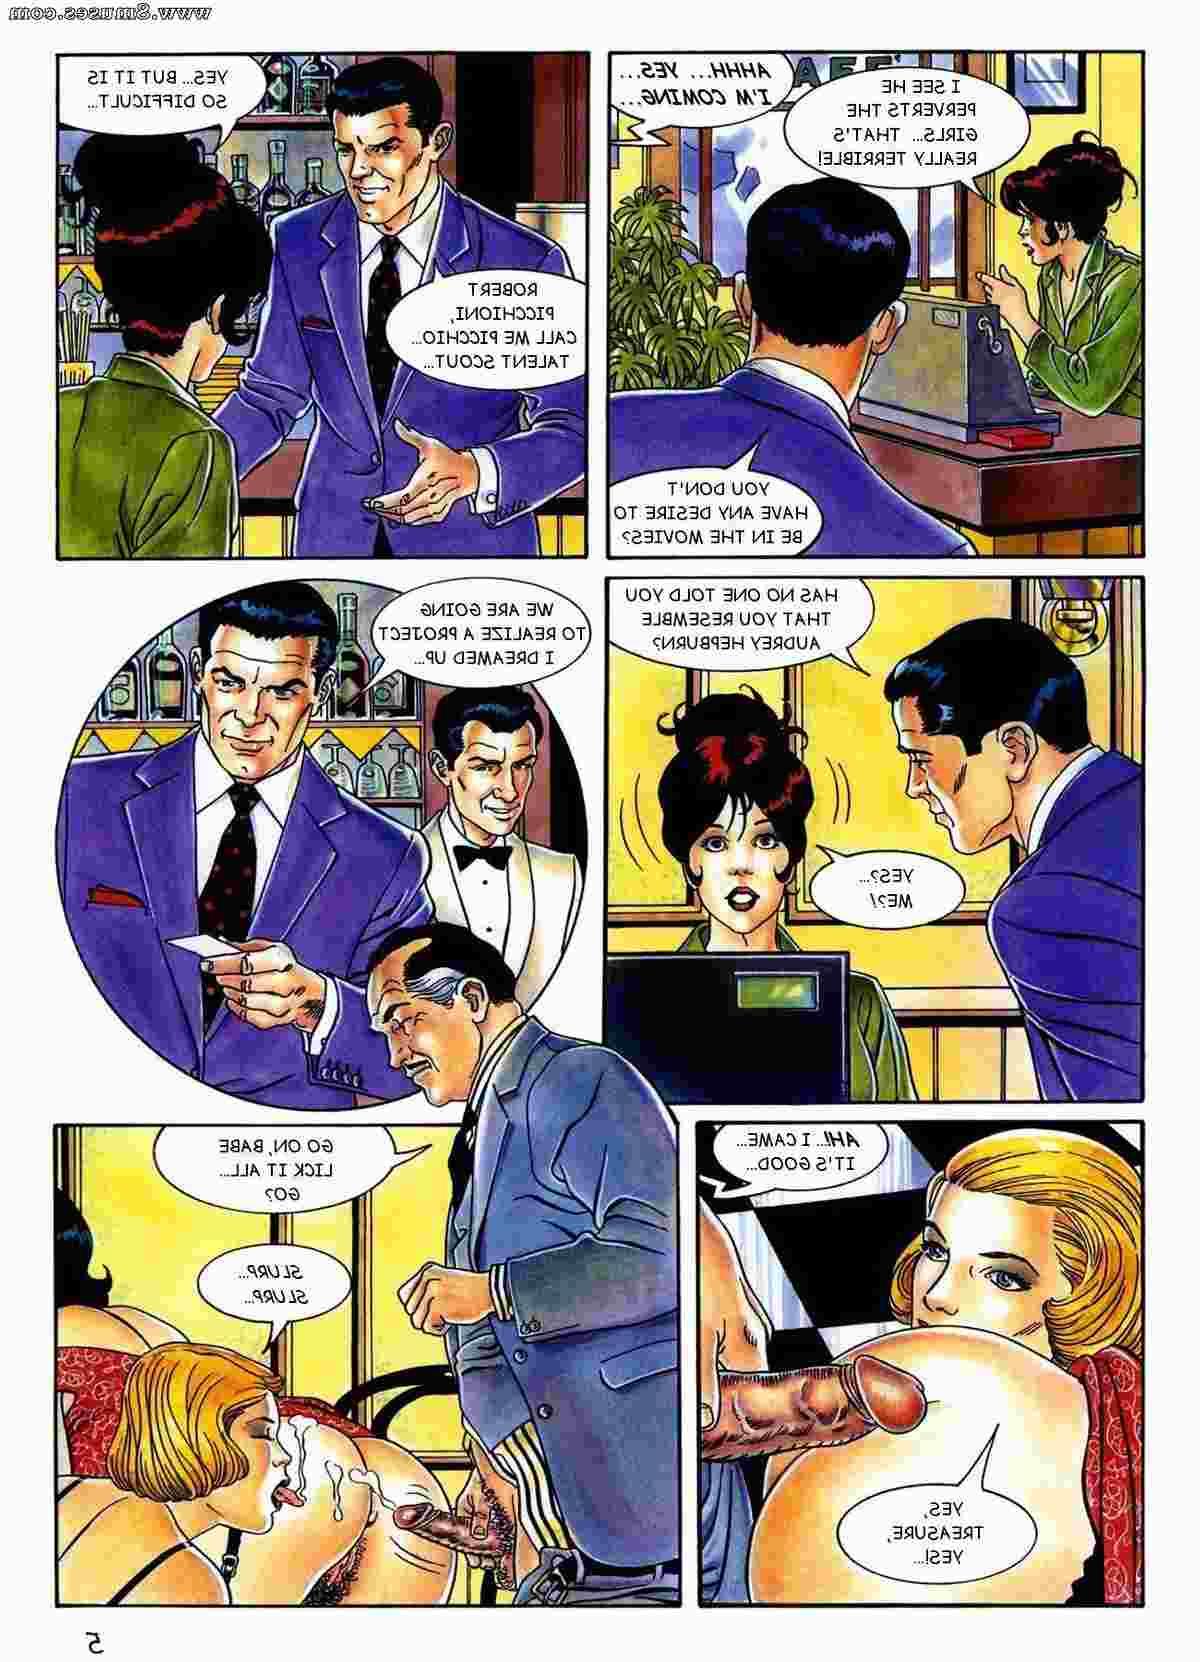 Stramaglia-Morale-Comics/Anna-Perverted-Innocence Anna_Perverted_Innocence__8muses_-_Sex_and_Porn_Comics_8.jpg